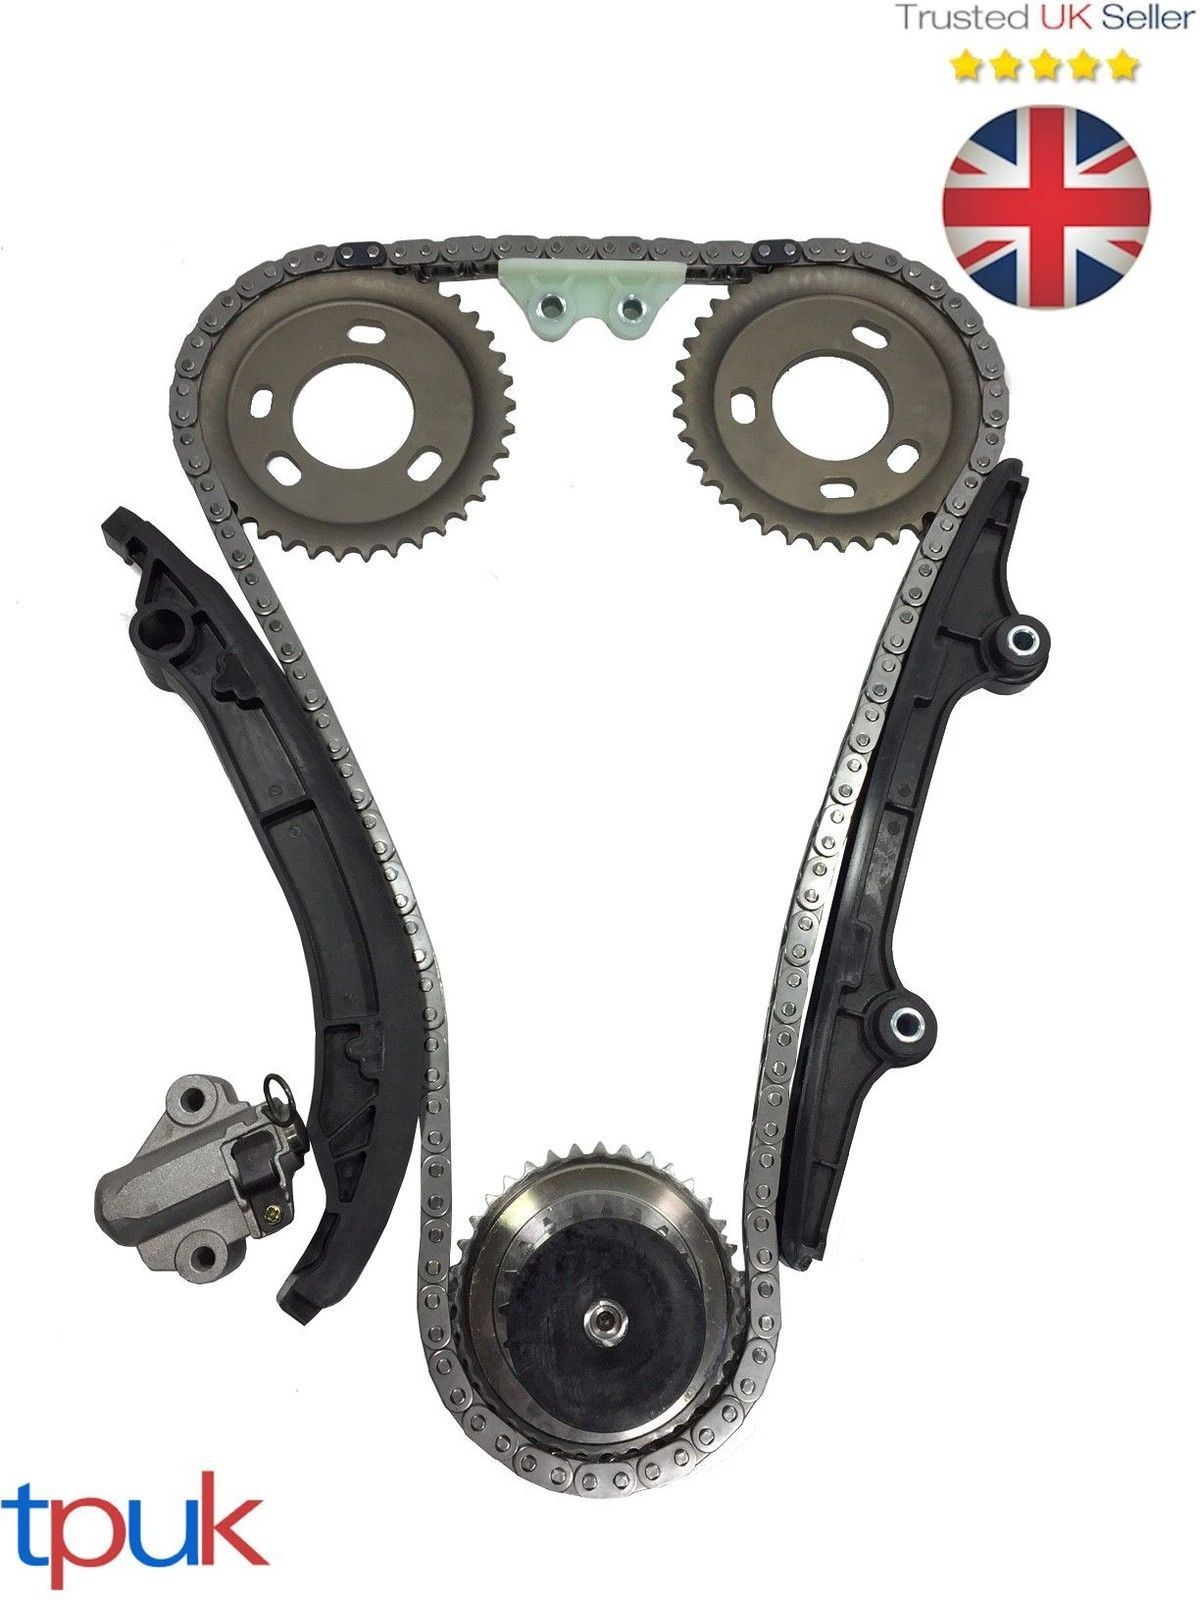 Gears Chaîne Guides Tendeur Land Rover Defender Timing Chain Kit 2.4 2006 sur